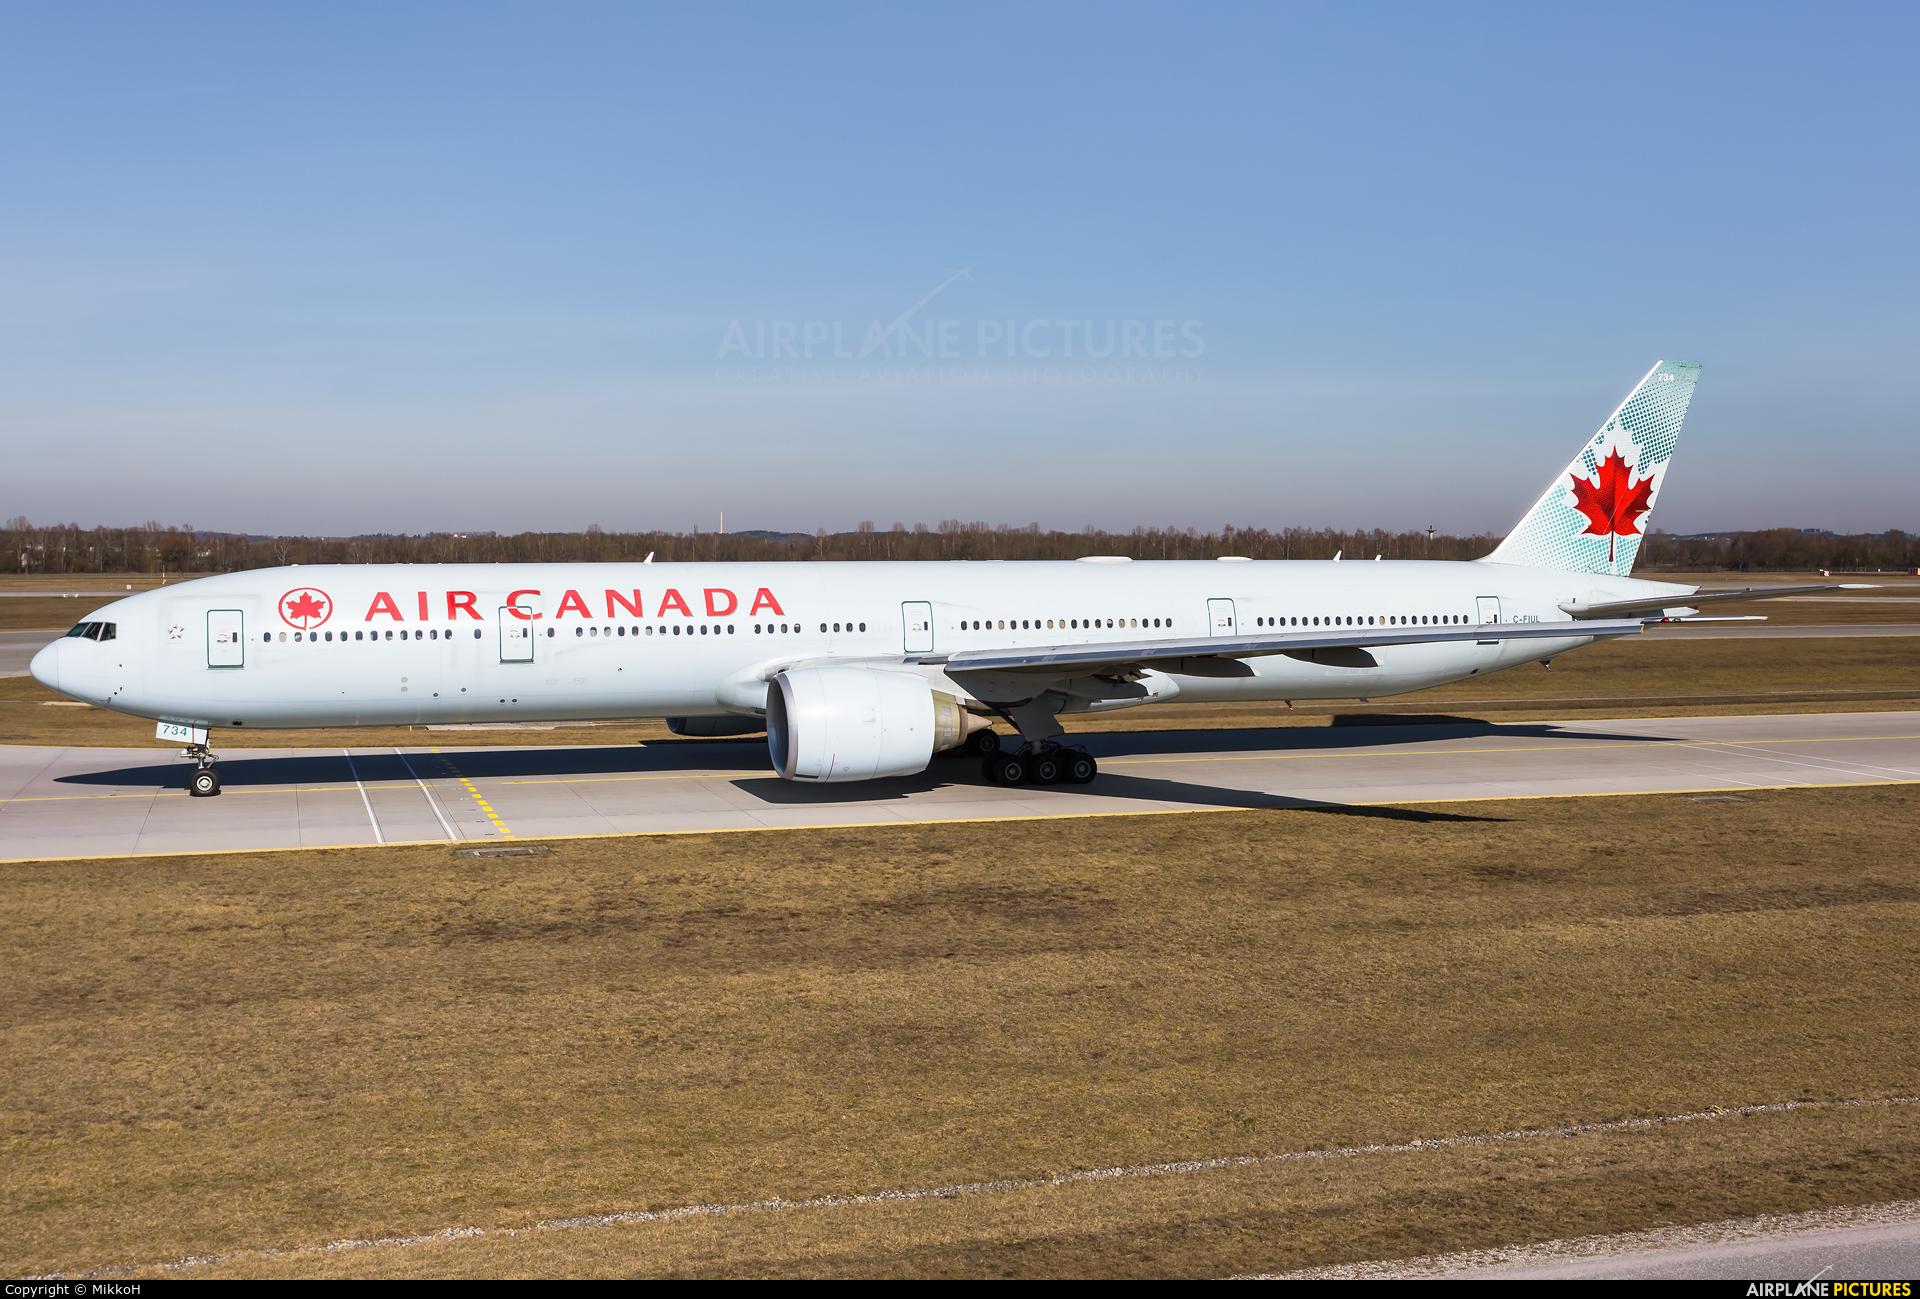 Air Canada C-FIUL aircraft at Munich